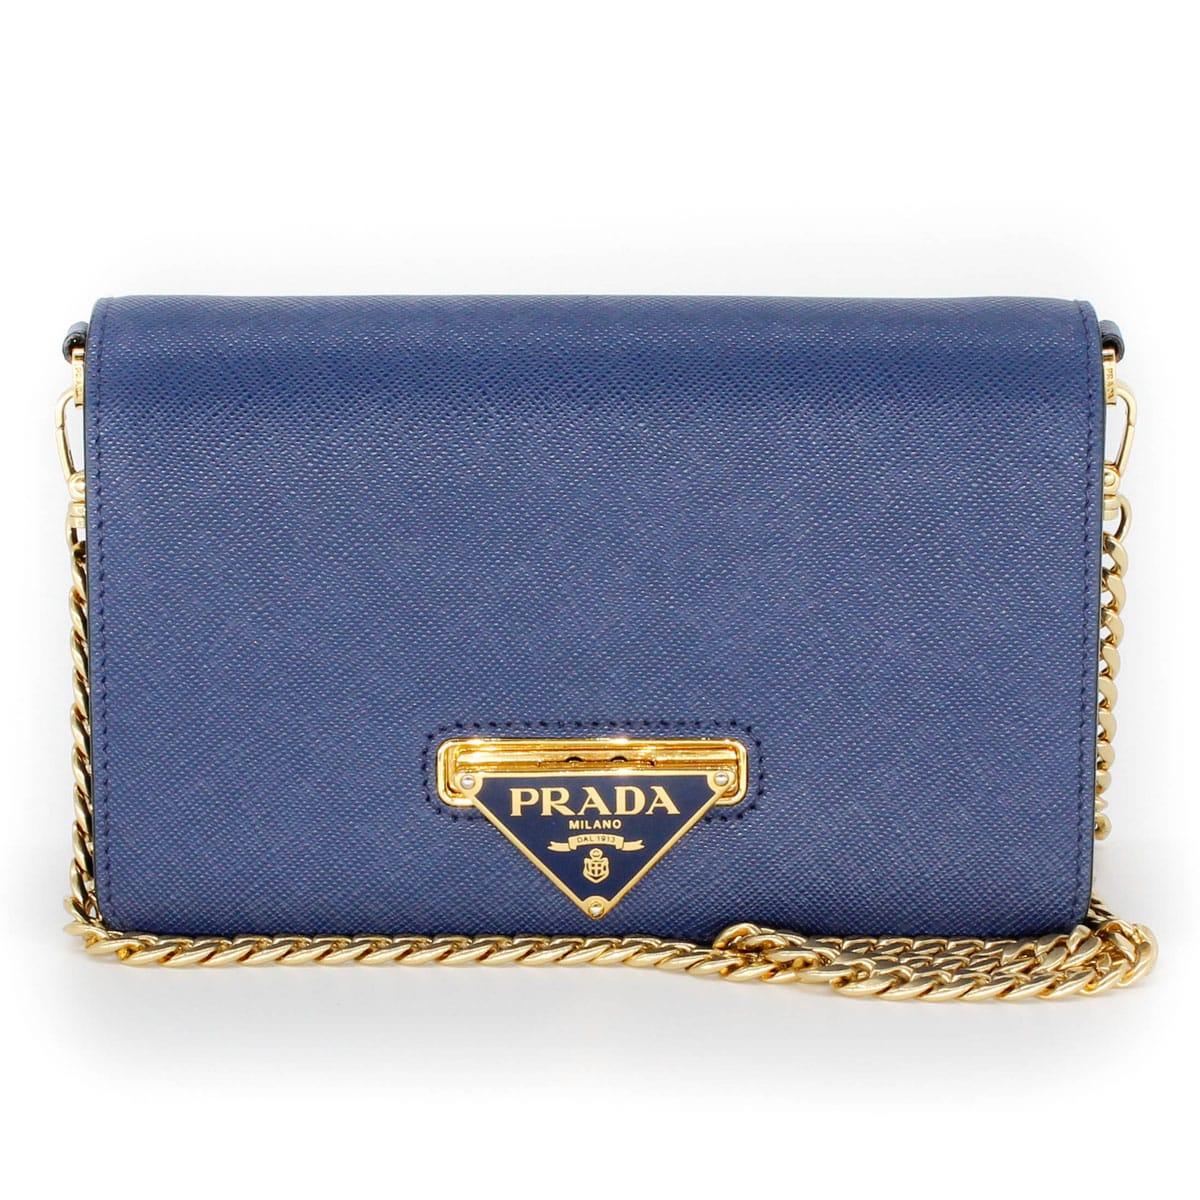 prada wallet on chain blue bag with prada logo front